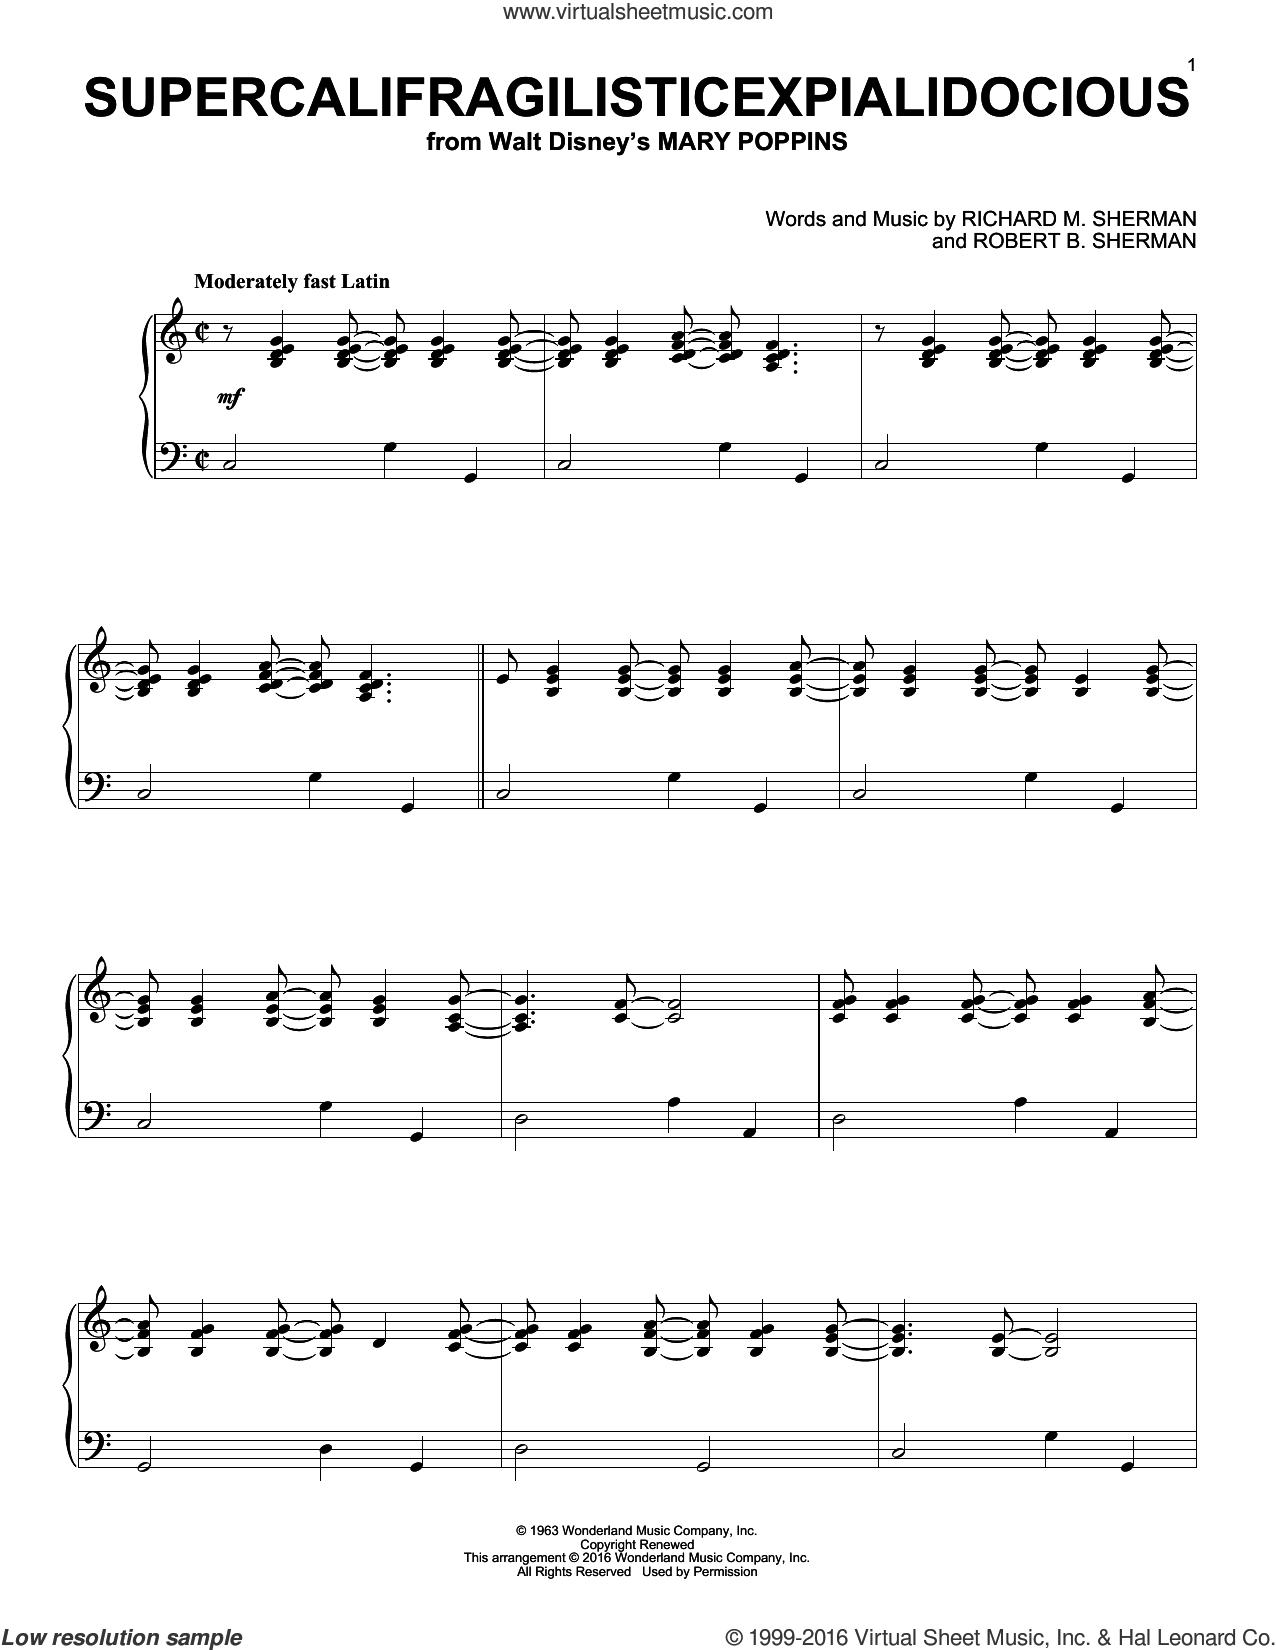 Supercalifragilisticexpialidocious [Jazz version] (from Mary Poppins) sheet music for piano solo by Richard & Robert Sherman, Richard M. Sherman and Robert B. Sherman, intermediate skill level